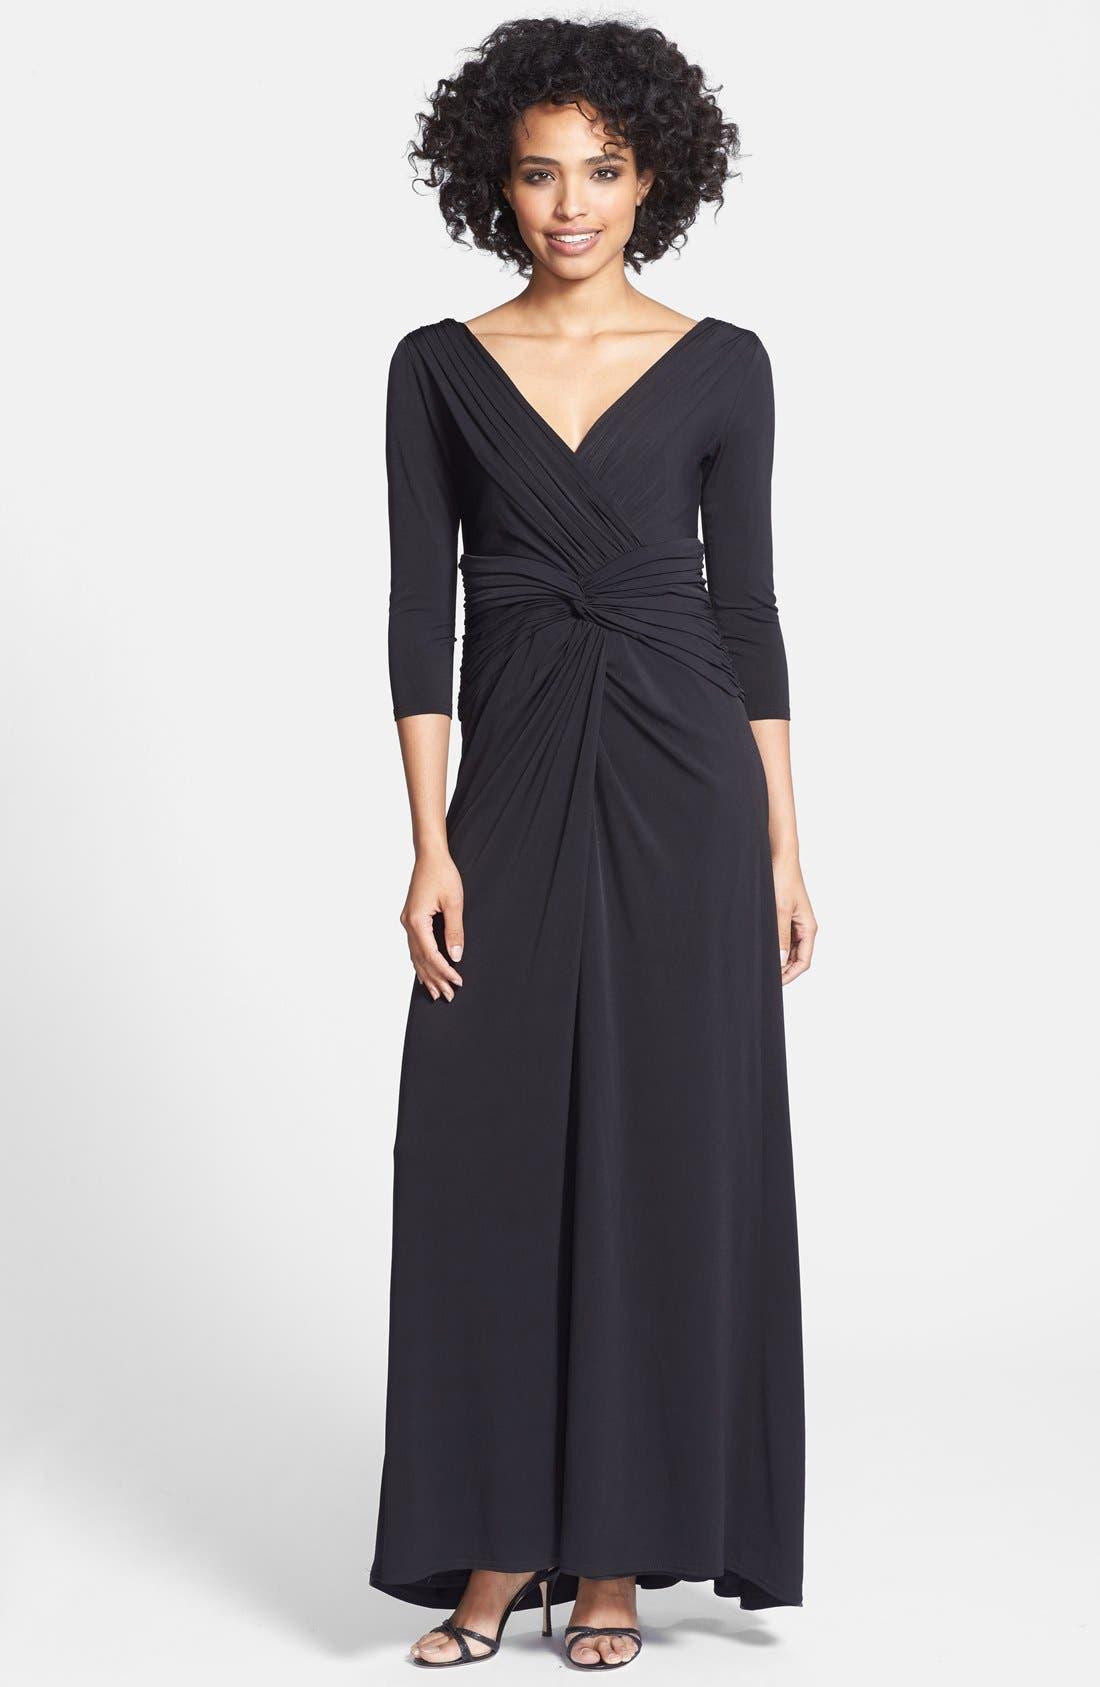 Alternate Image 1 Selected - Tadashi Shoji Twist Front Jersey V-Neck Gown